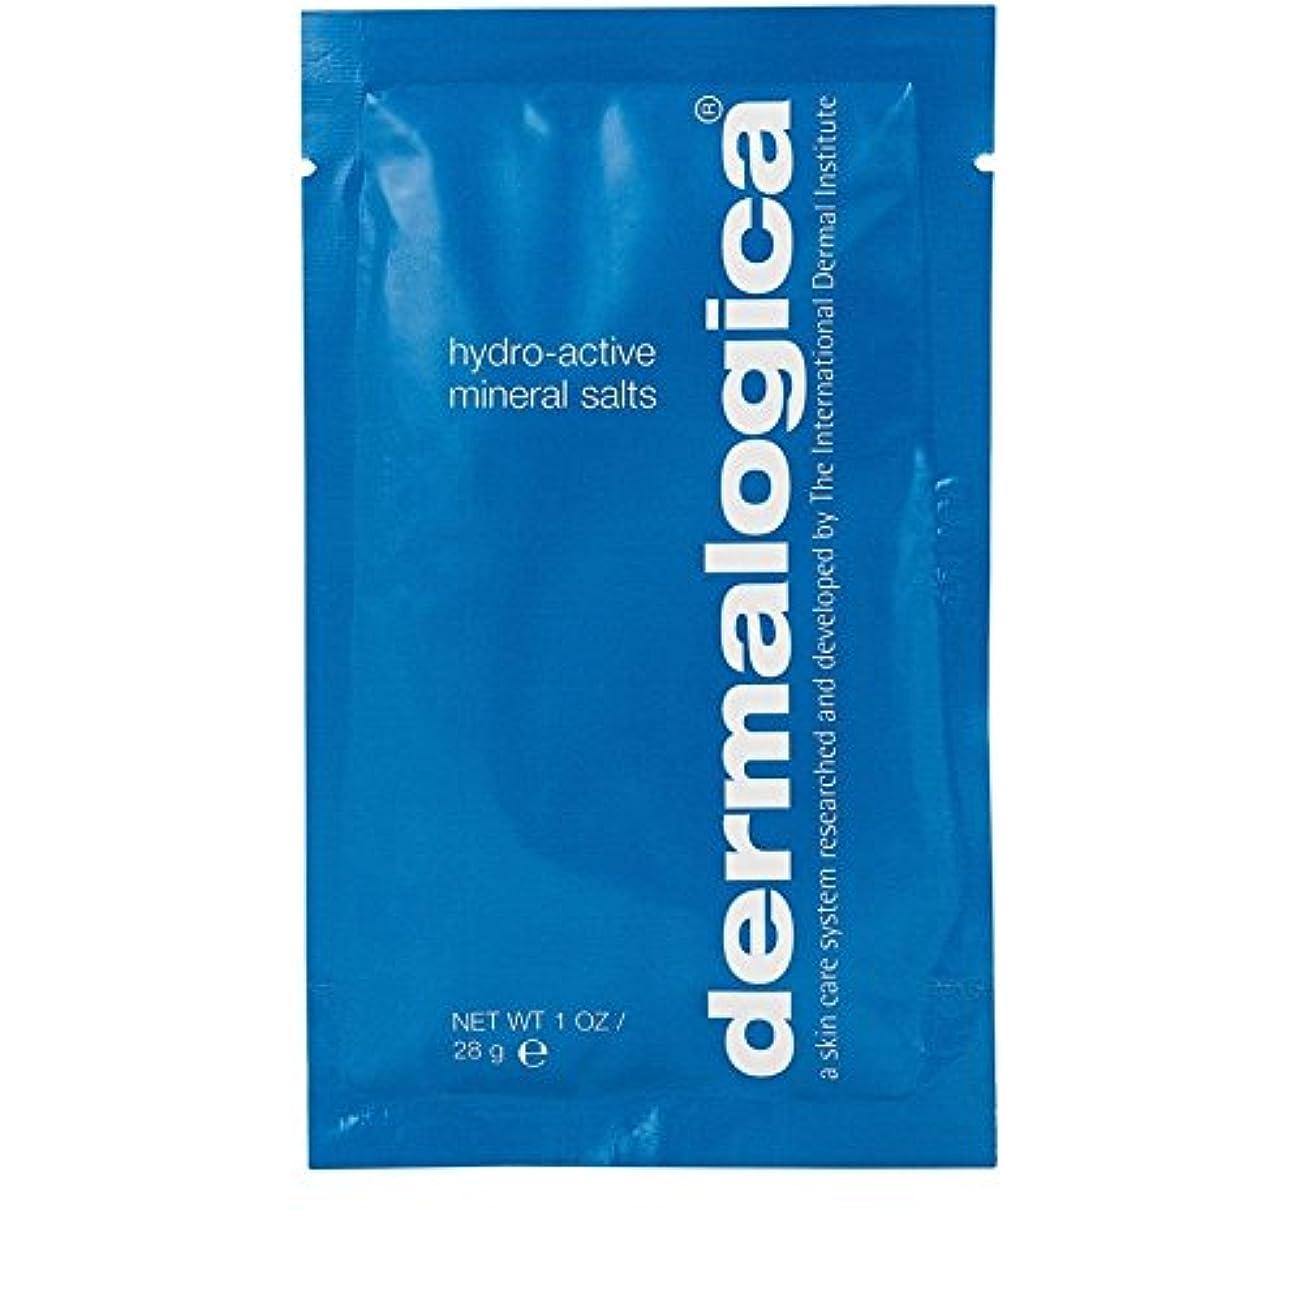 Dermalogica Hydro Active Mineral Salt 28g (Pack of 6) - ダーマロジカ水力アクティブミネラル塩28グラム x6 [並行輸入品]